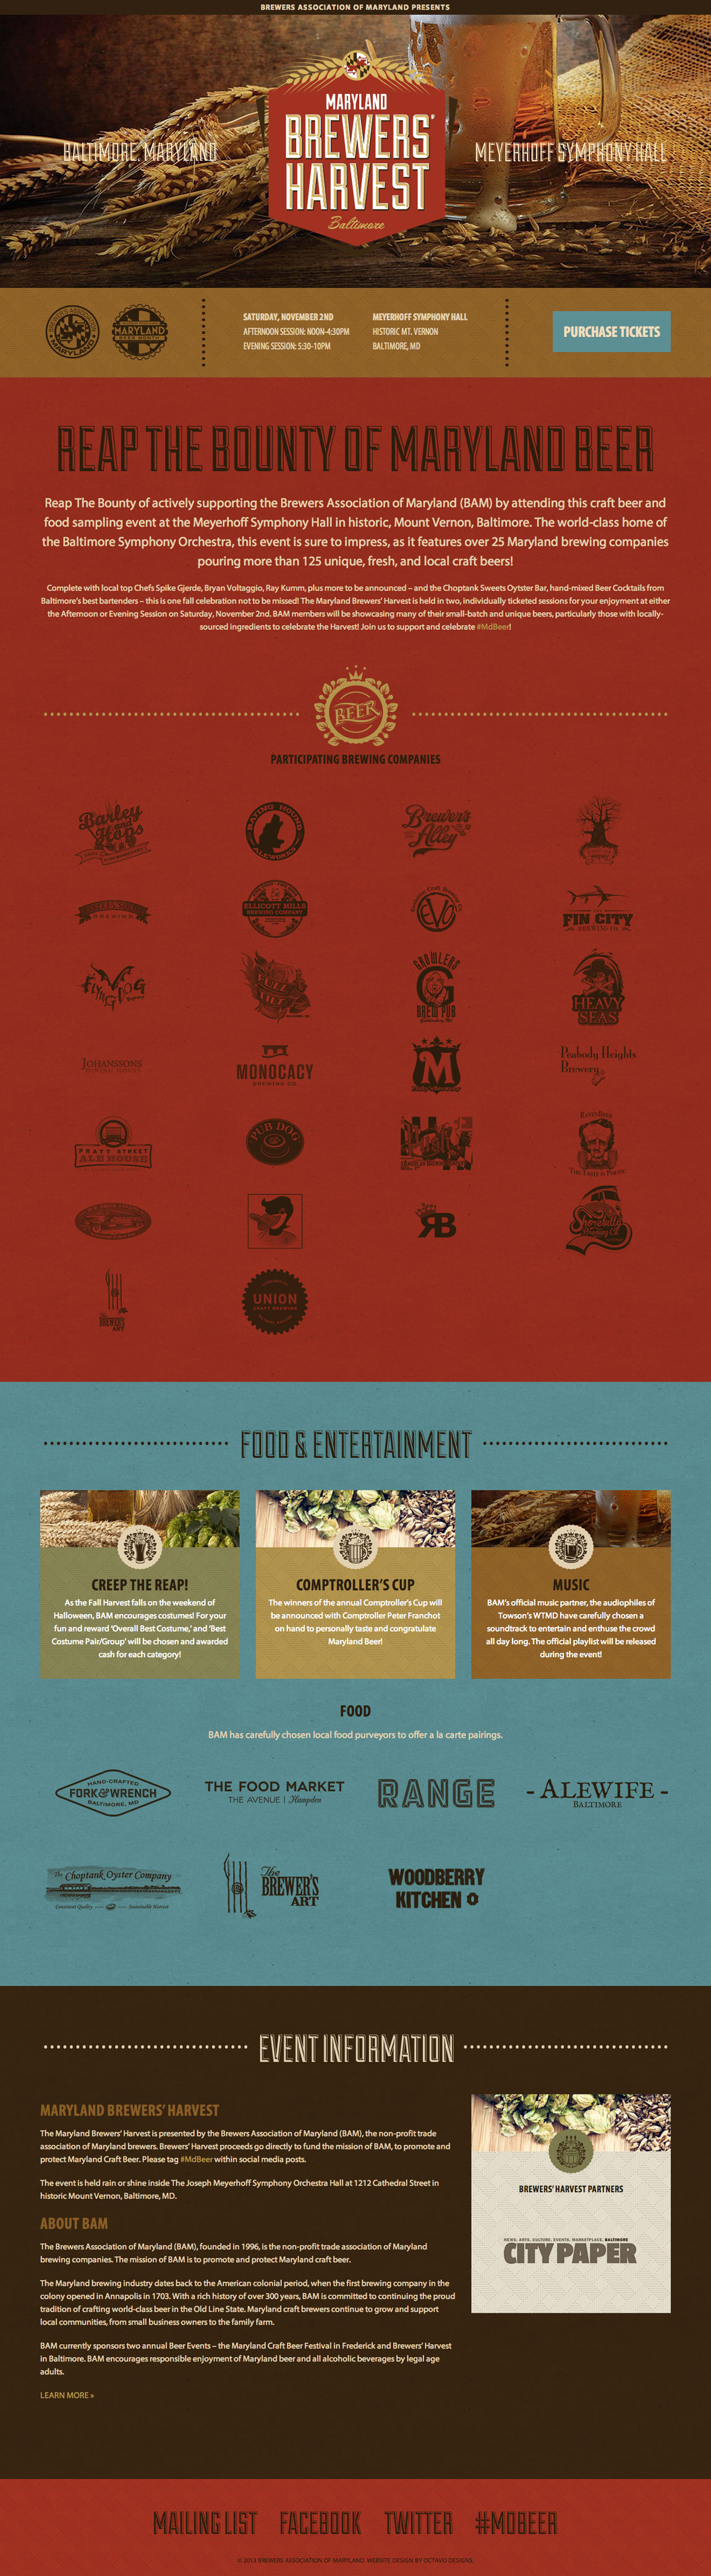 Maryland Brewers' Harvest Website Screenshot